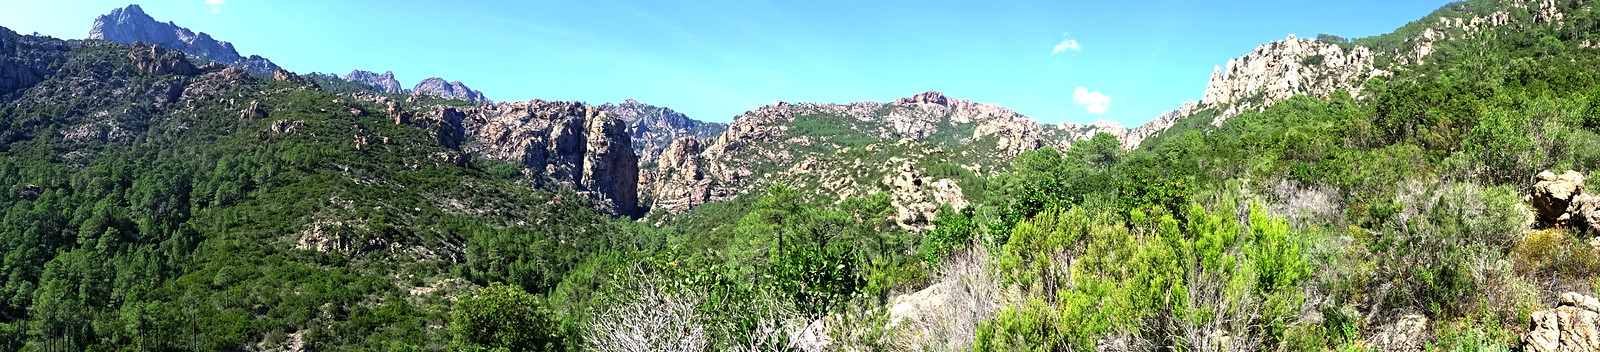 Redescente vers le Cavu : panoramique Bunifazinca - brèche du Carciara - crête de Cervi